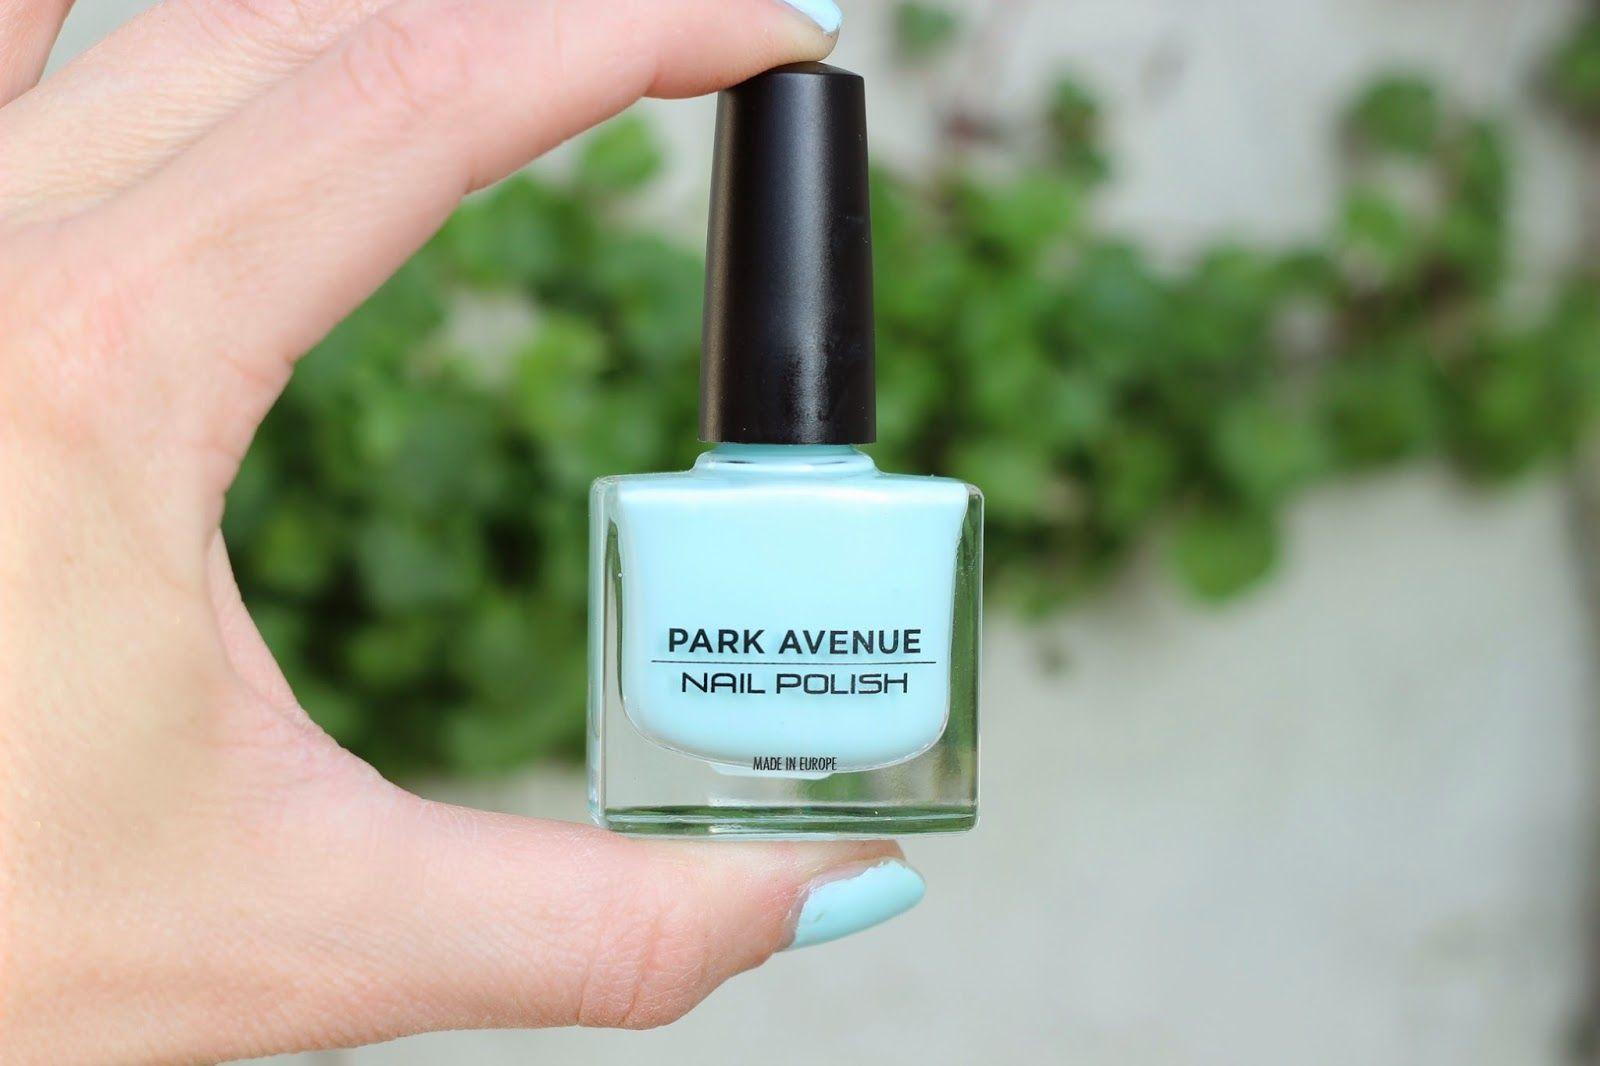 Sprinkles on a cupcake: Park Avenue - Delicate pastel blue nail polish